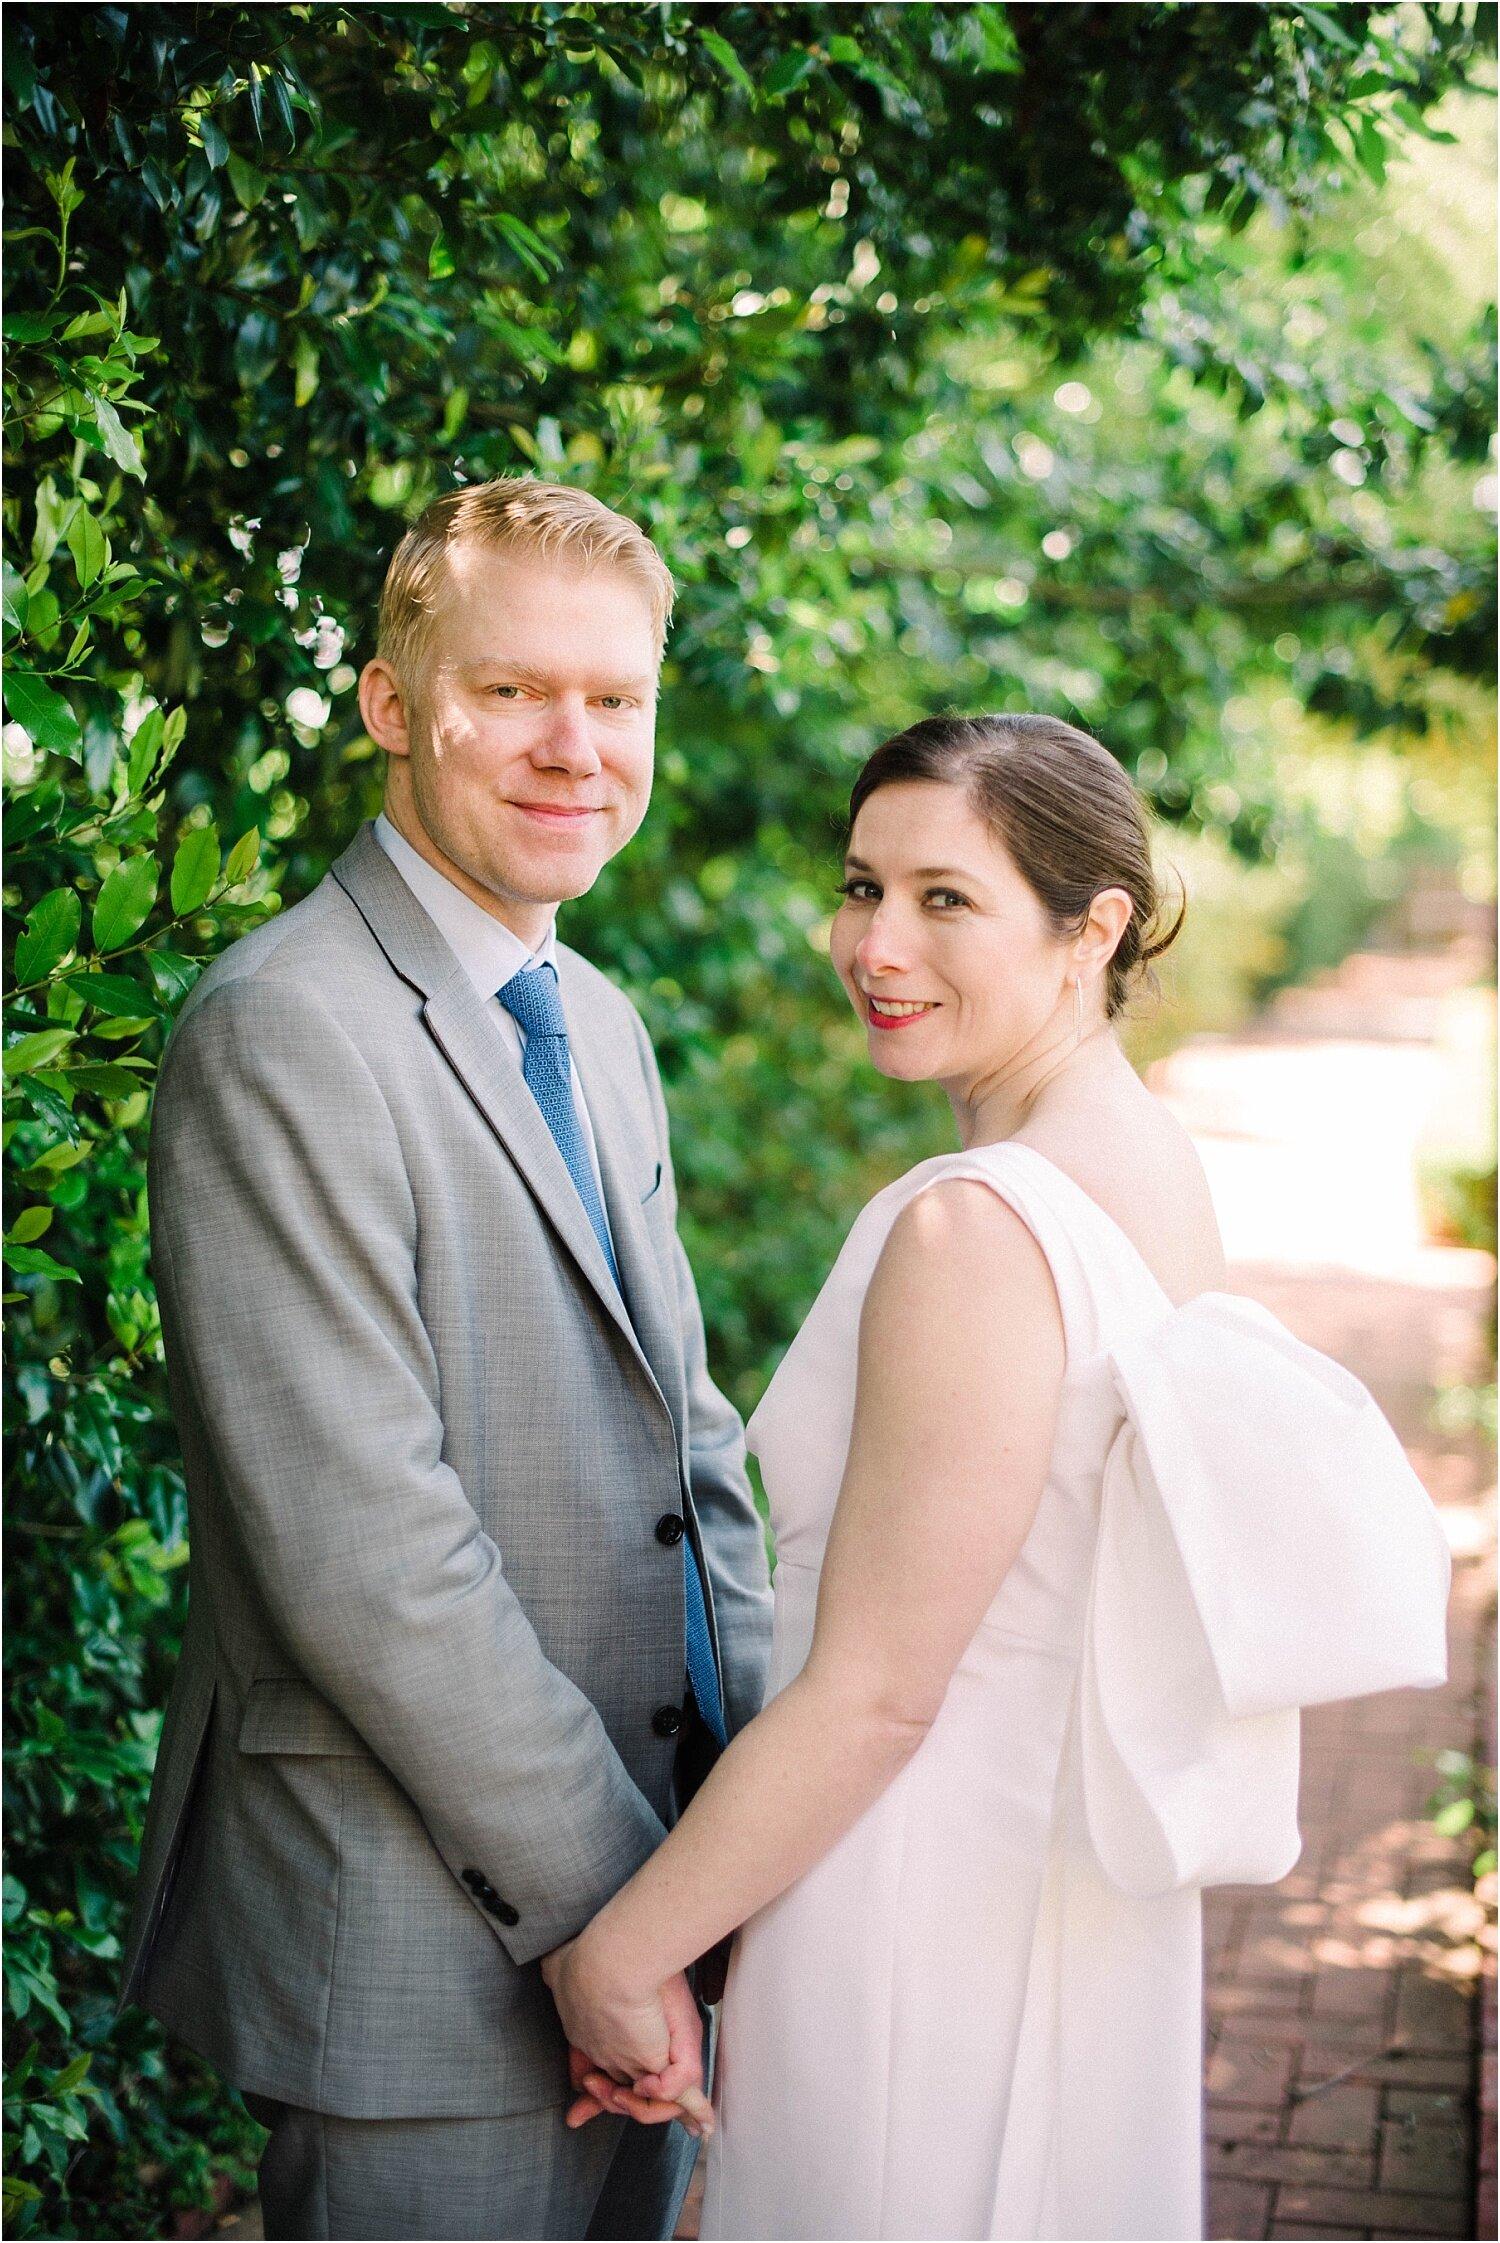 Heather + Scott-Longue-Vue-house-and-gardens-black-tie-wedding-photos_Gabby Chapin_Print_0110_BLOG.jpg